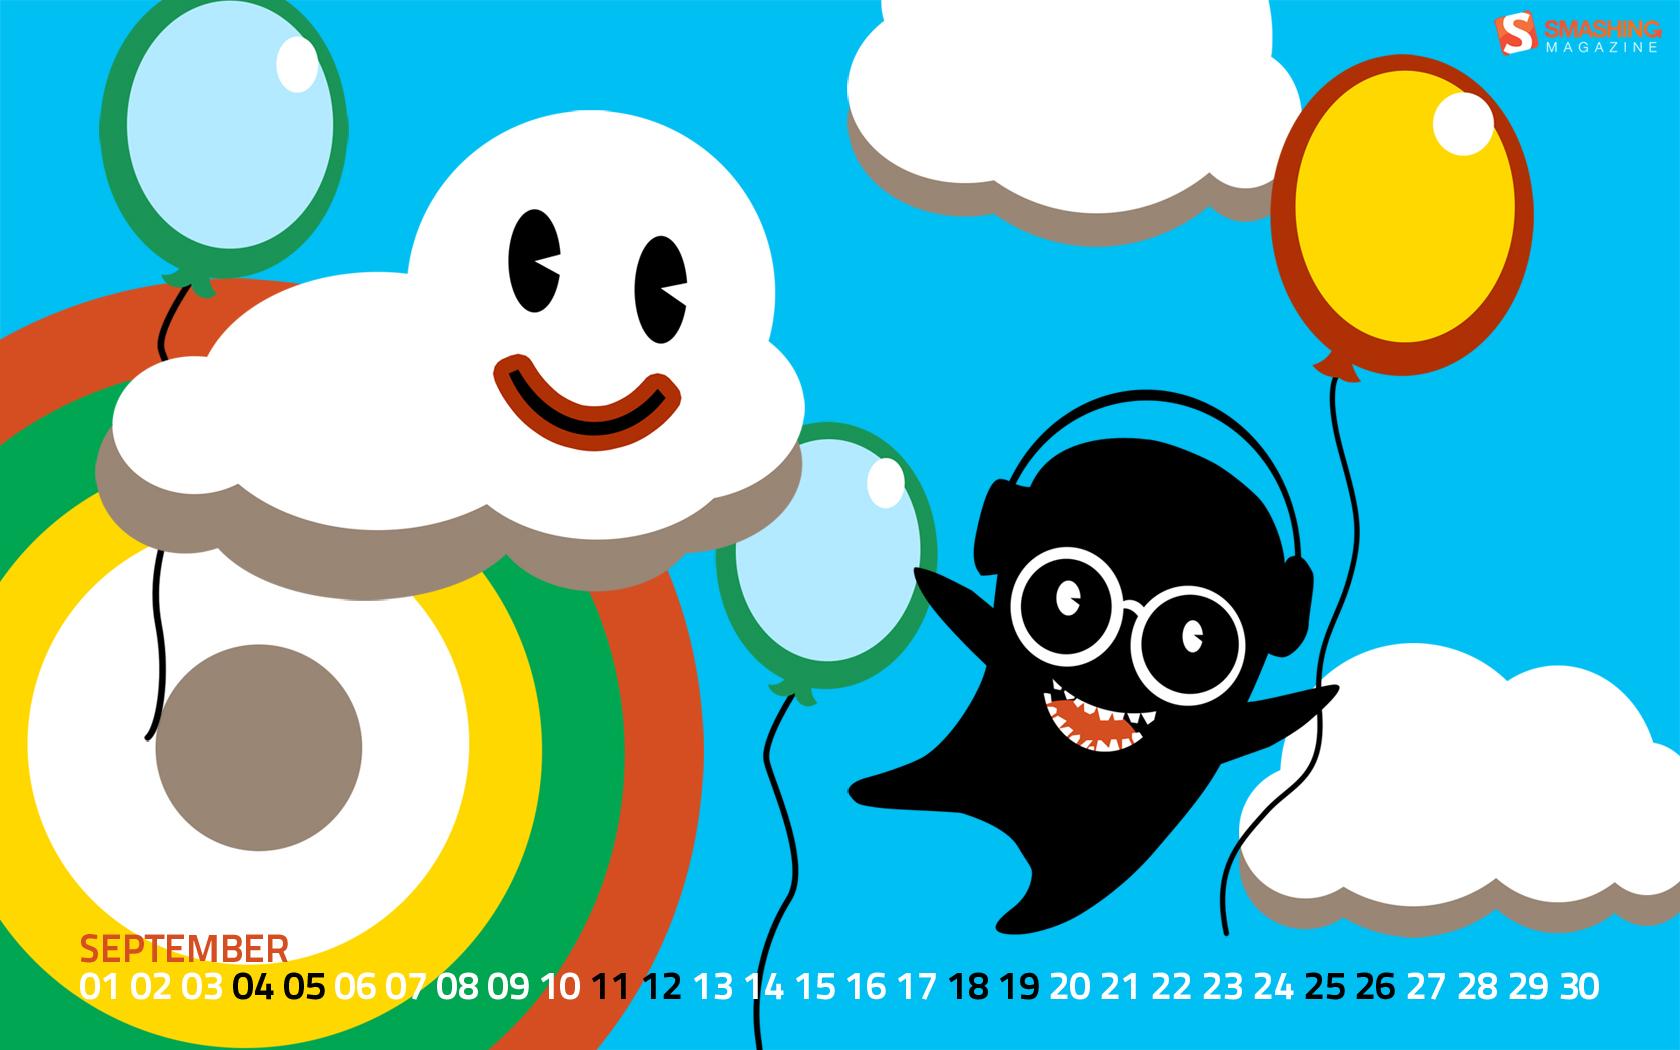 Happy-place in Desktop Wallpaper Calendar: September 2010